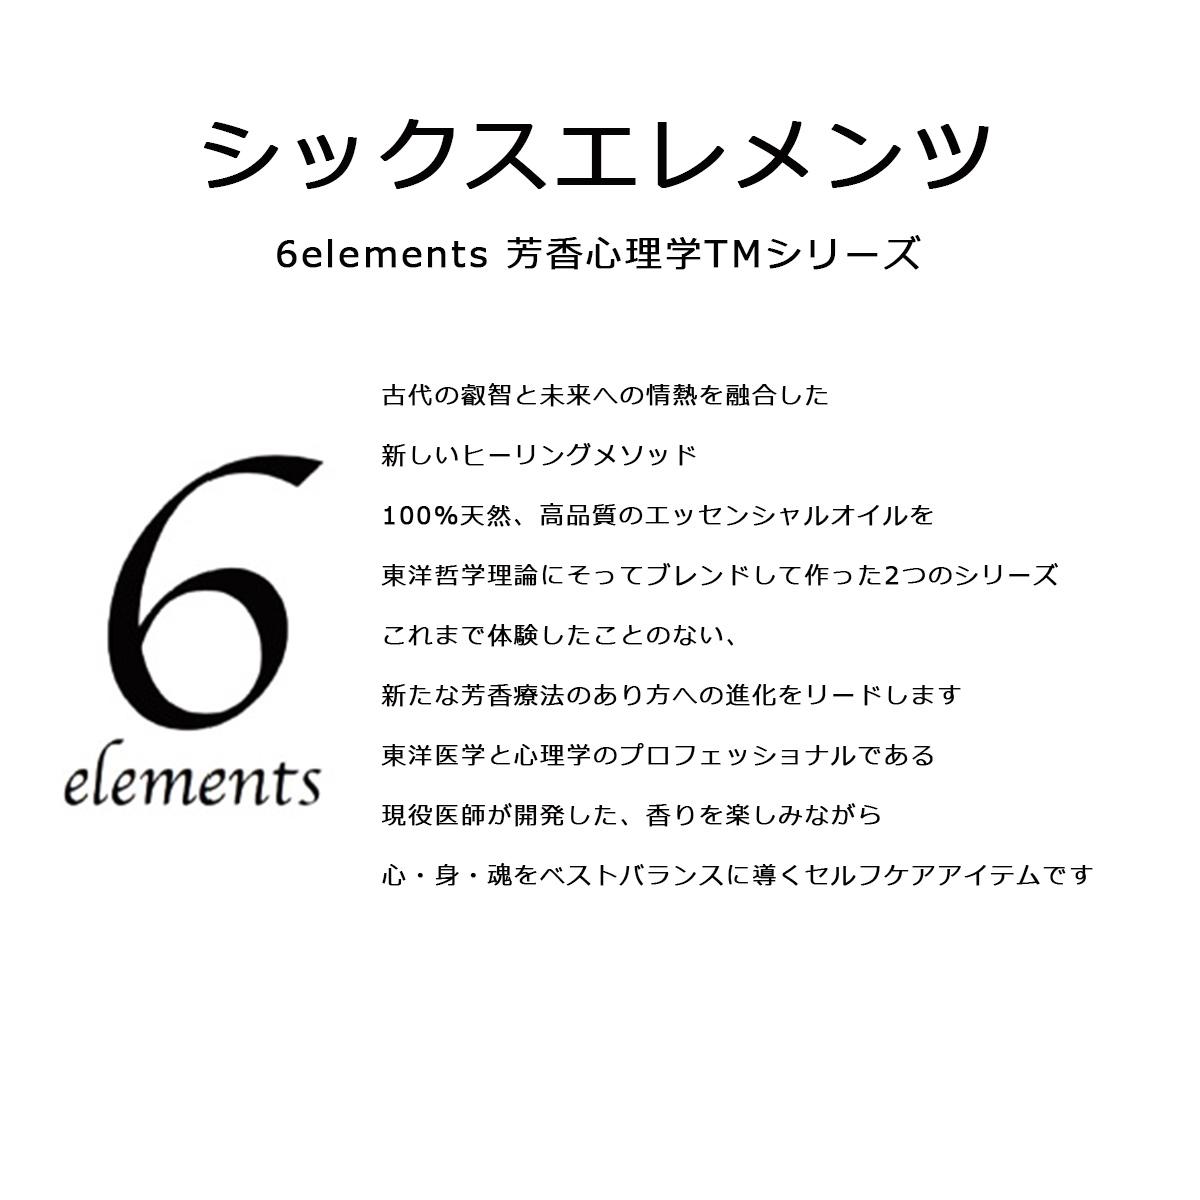 6elements Japan 六行ROKUGYO 金GON 2mL 【 翌日配達 送料無料 】 【 アロマ アロマテラピー 天然成分 高品質 エッセンシャルオイル  】